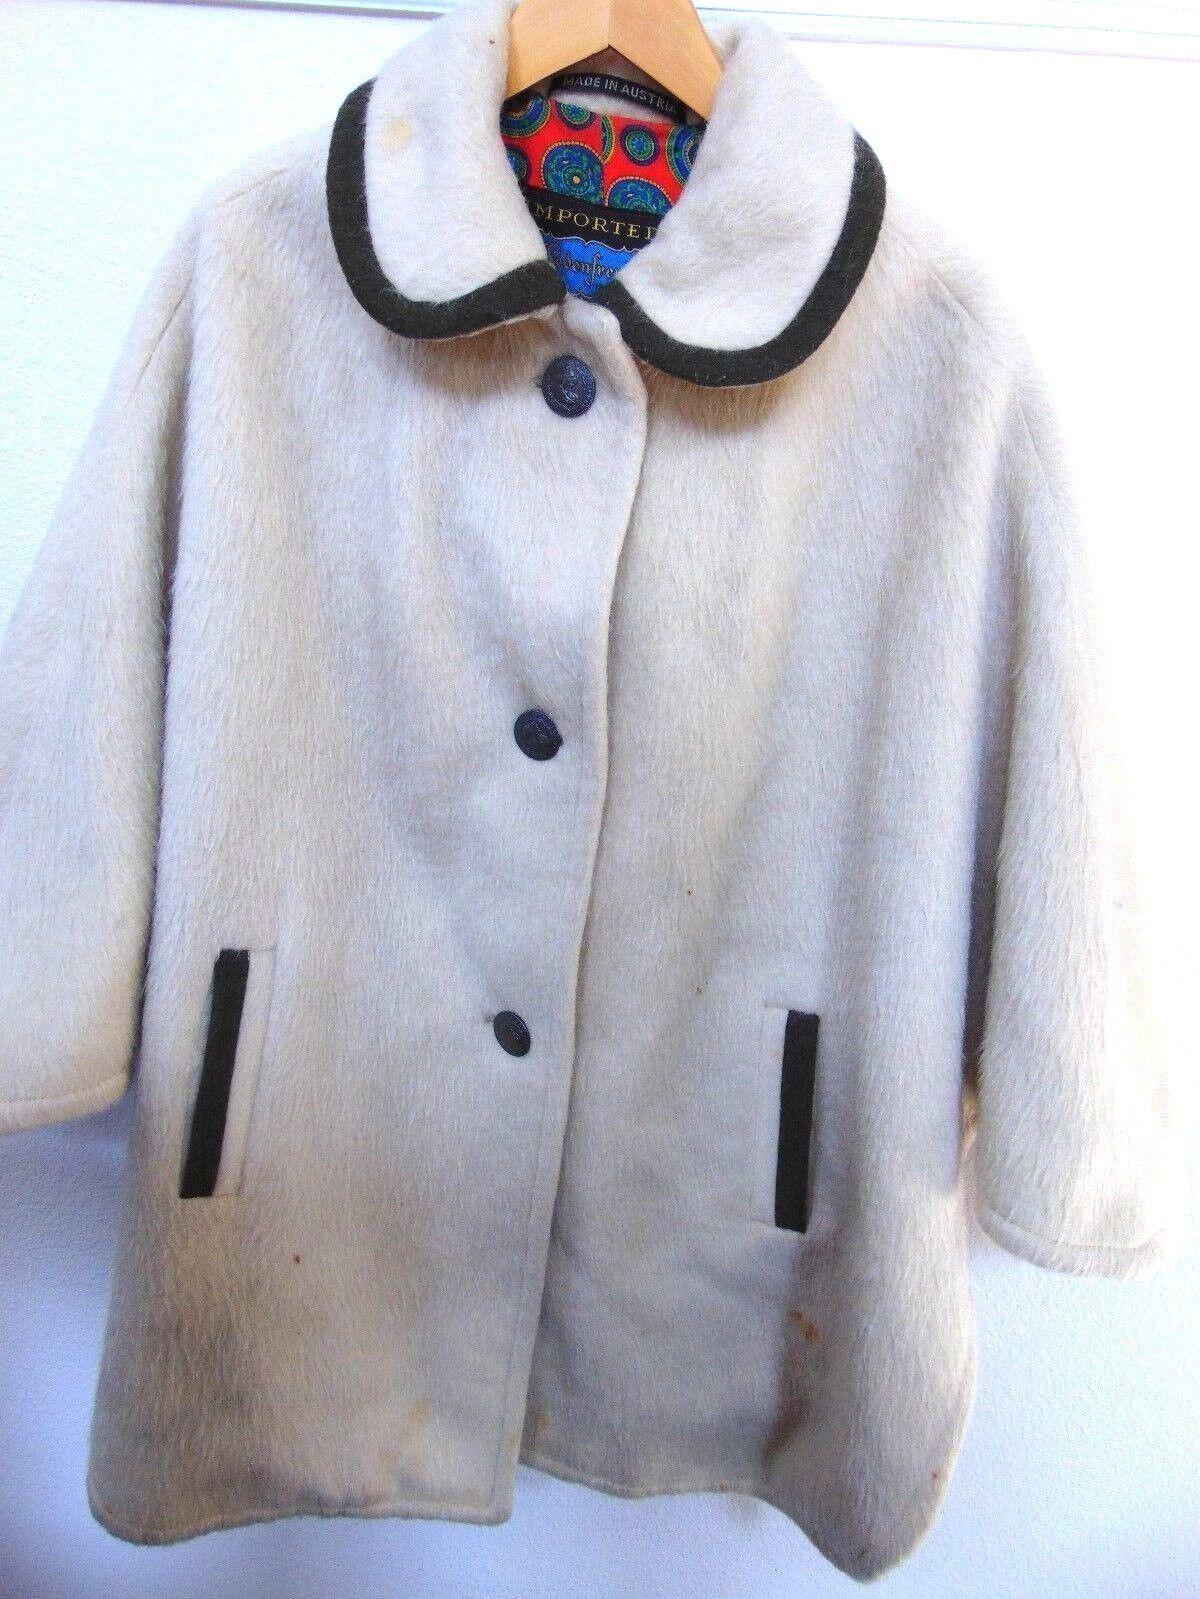 Vintage Lodenfrey Austria Poncho Cloak Cape Cream Wool Retro One Size Large XL